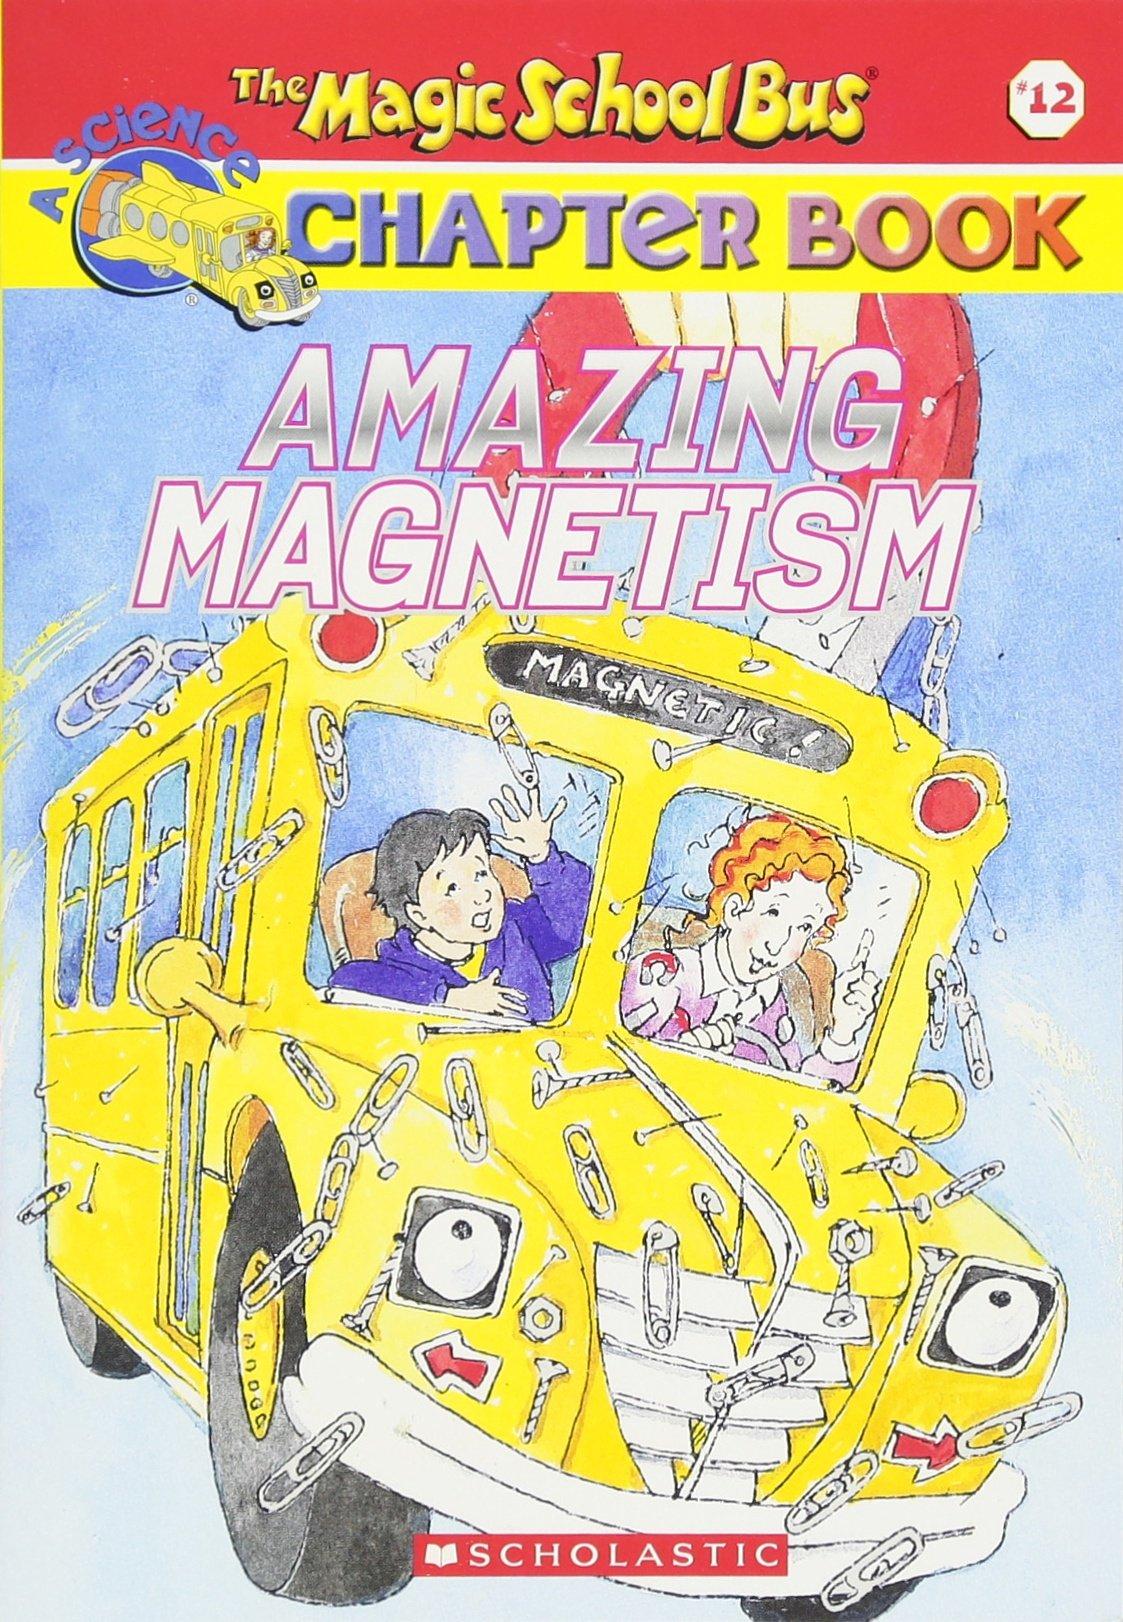 Read Online Amazing Magnetism (Magic School Bus Chapter Book #12) pdf epub